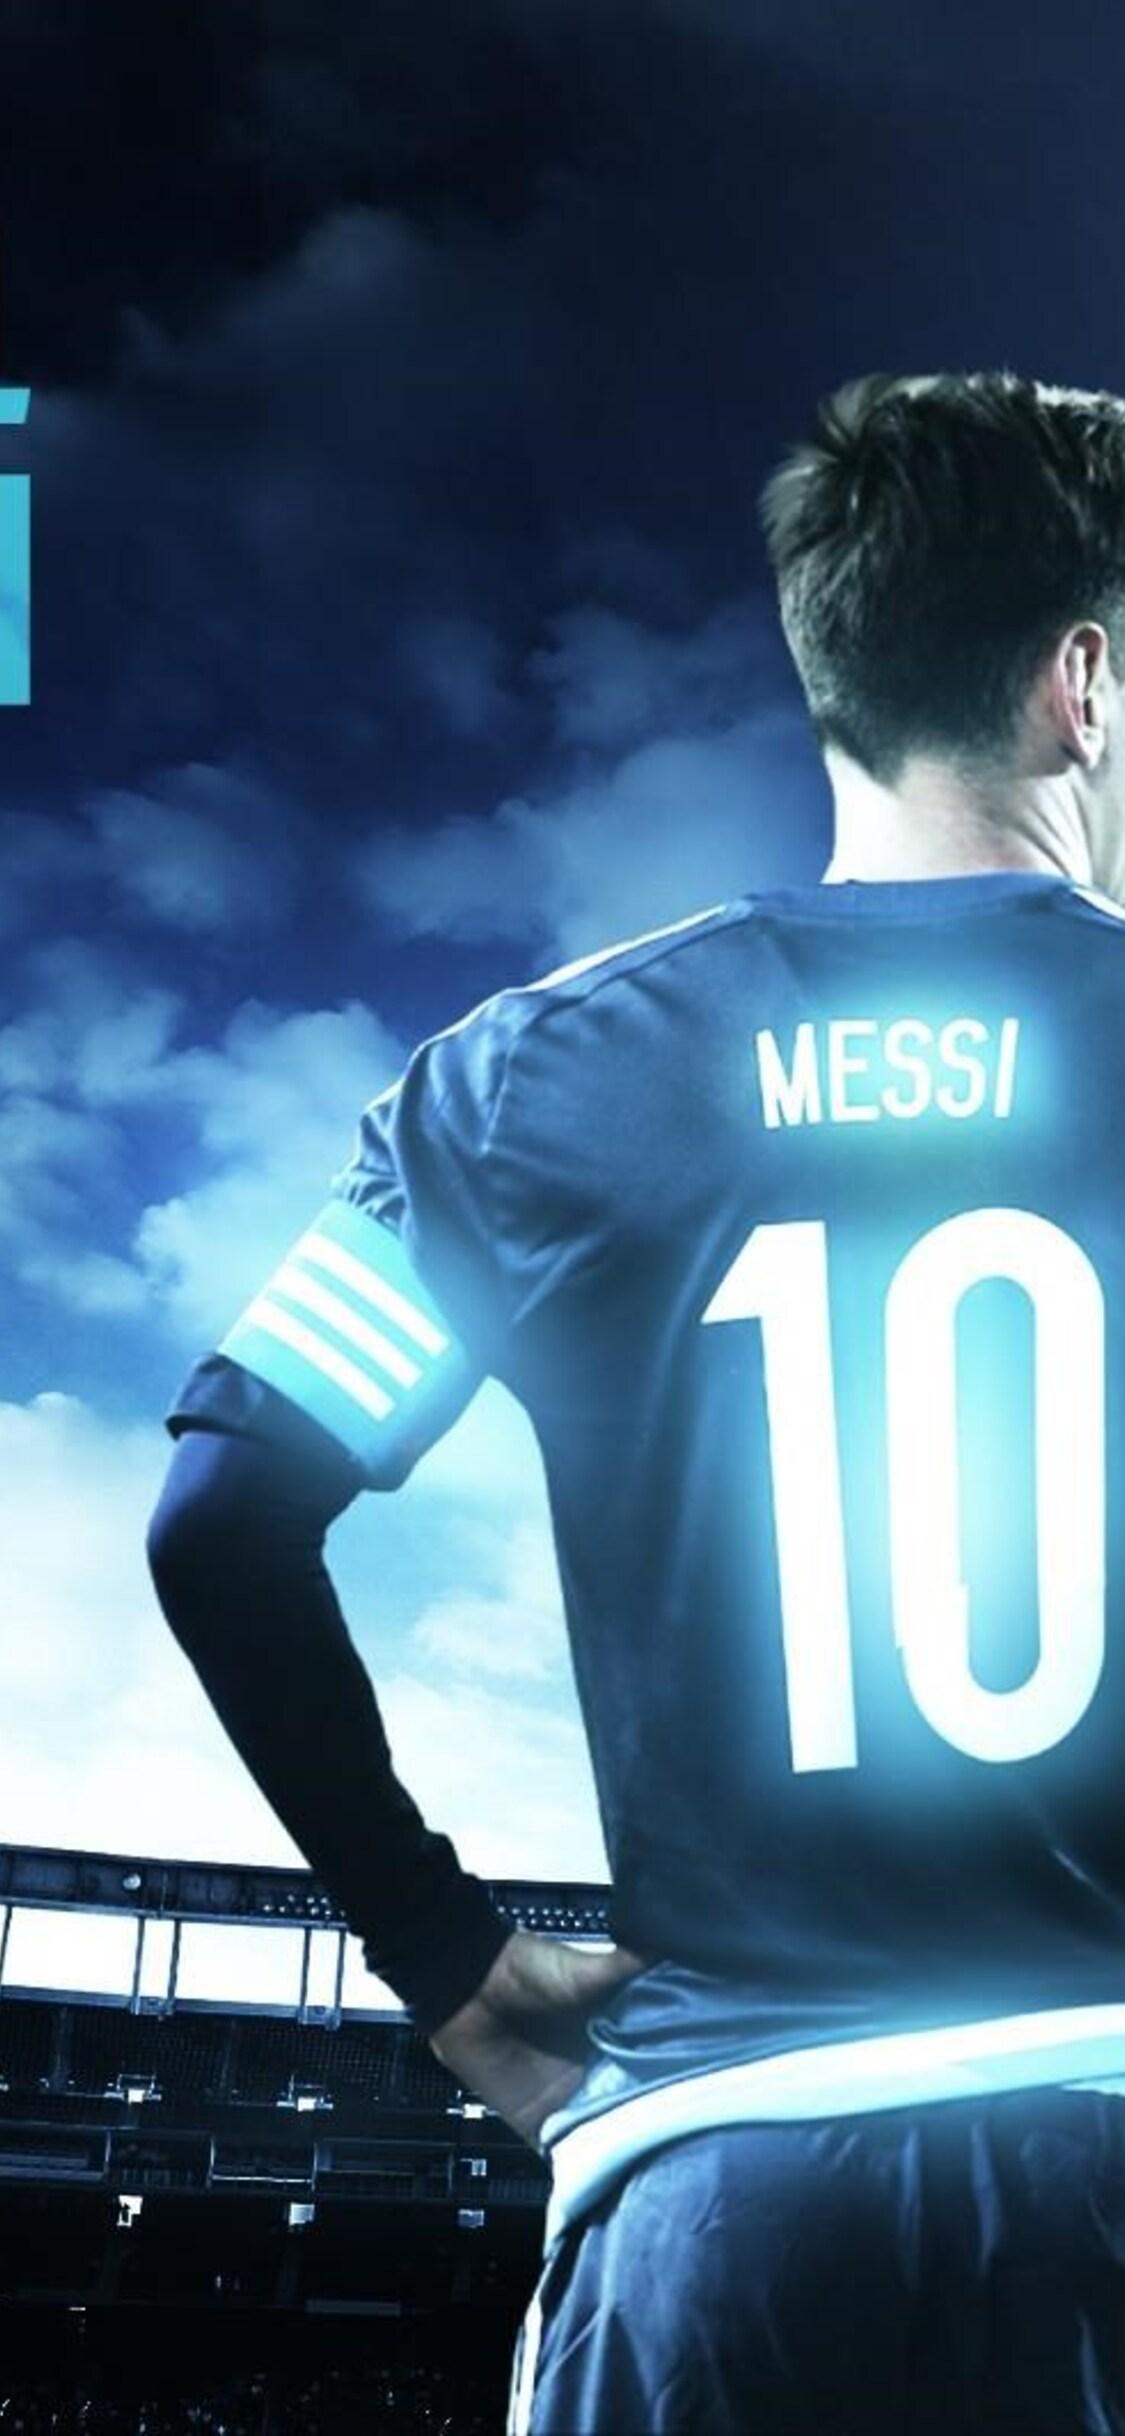 1125x2436 Leo Messi Iphone Xs Iphone 10 Iphone X Hd 4k Wallpapers